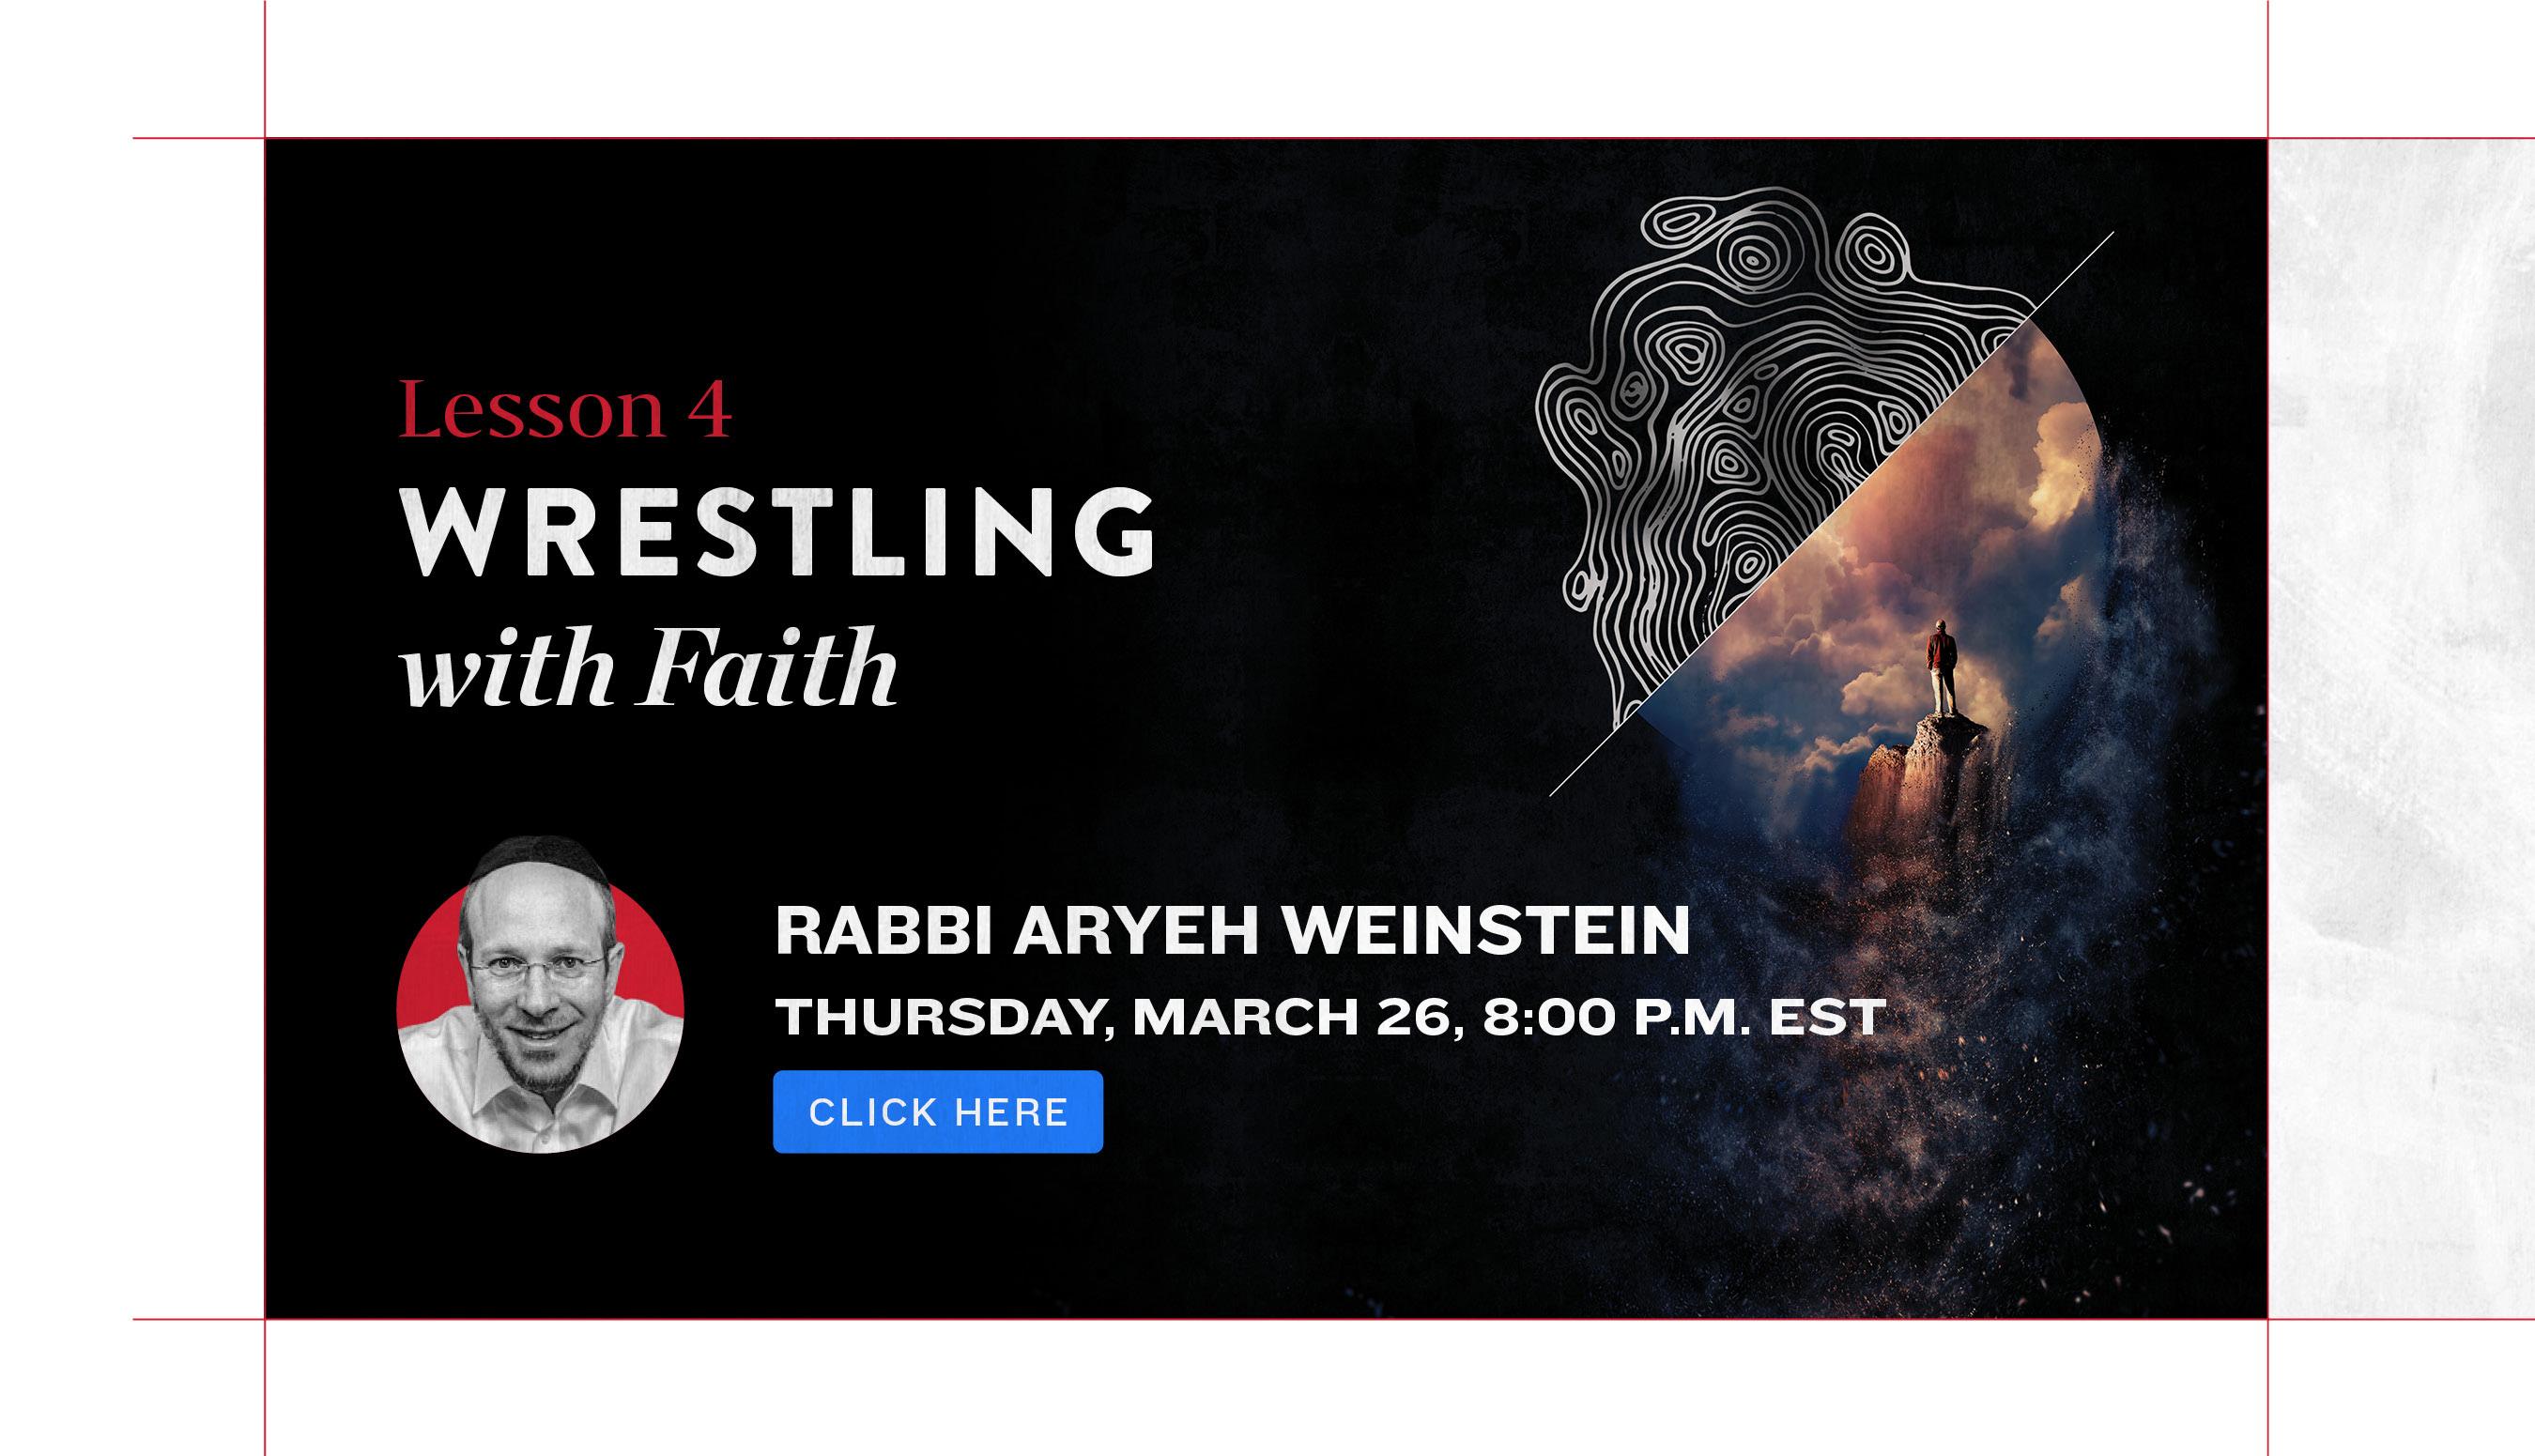 Wrestling with Faith Lesson 4. Rabbi Aryeh Weinstein